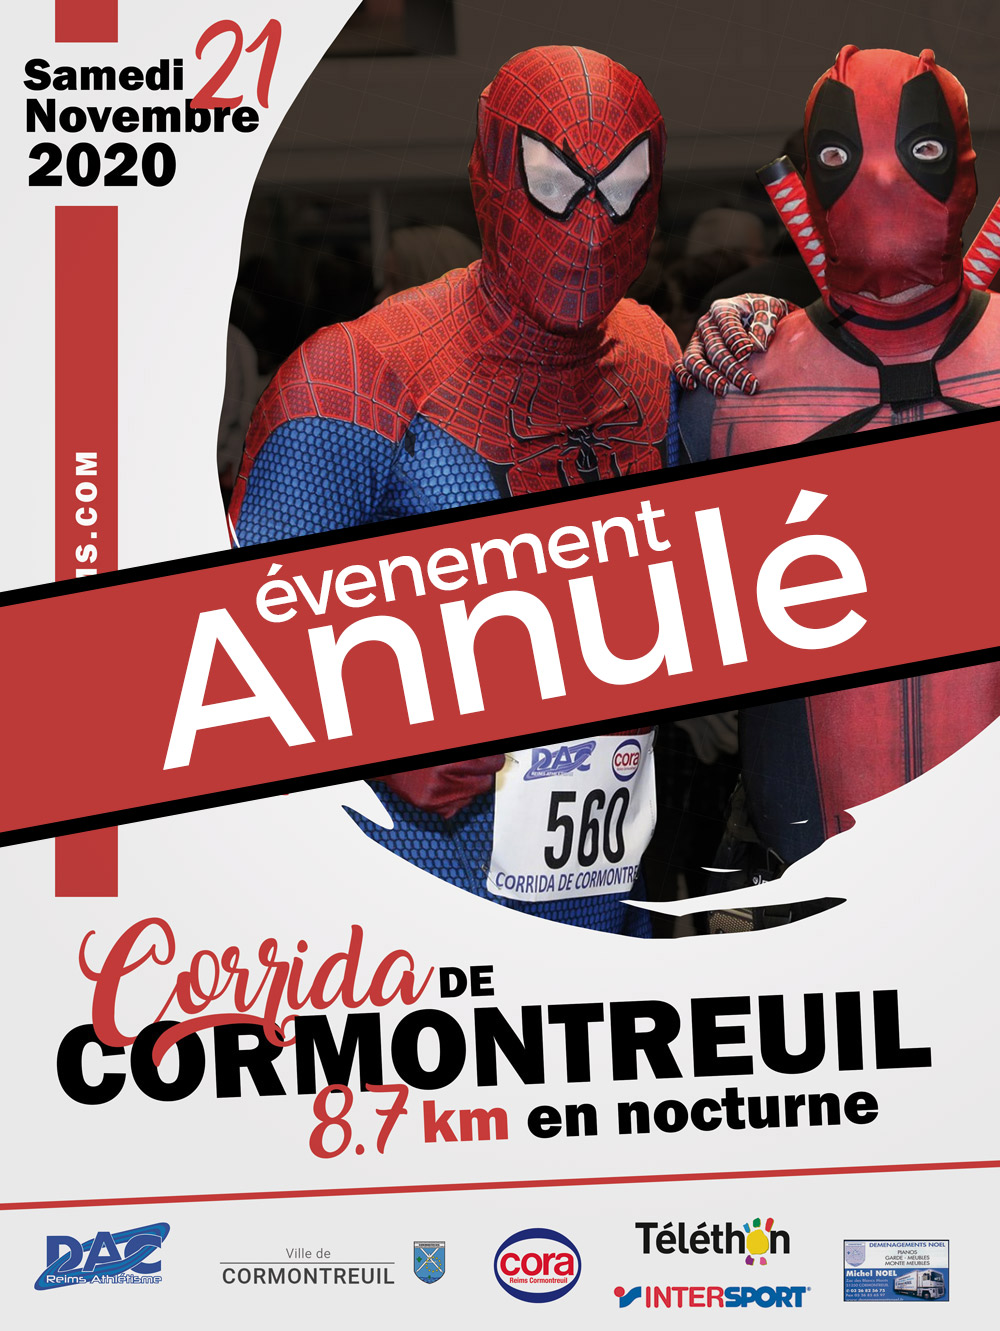 corrida cormontreuil 2020 annulée